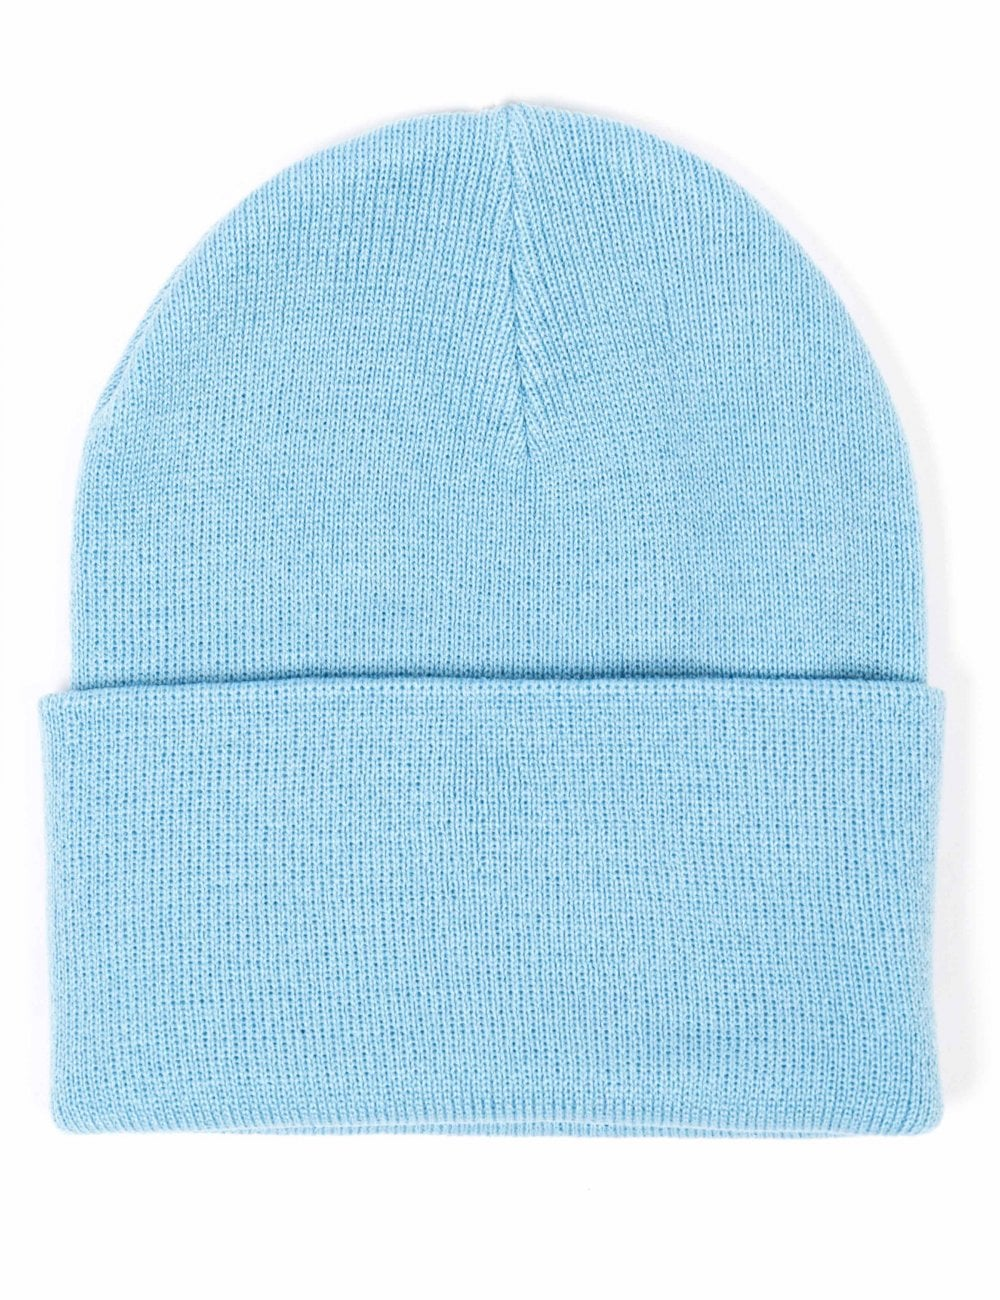 Carhartt WIP Watch Hat - Capri - Accessories from Fat Buddha Store UK 349effb18c4d